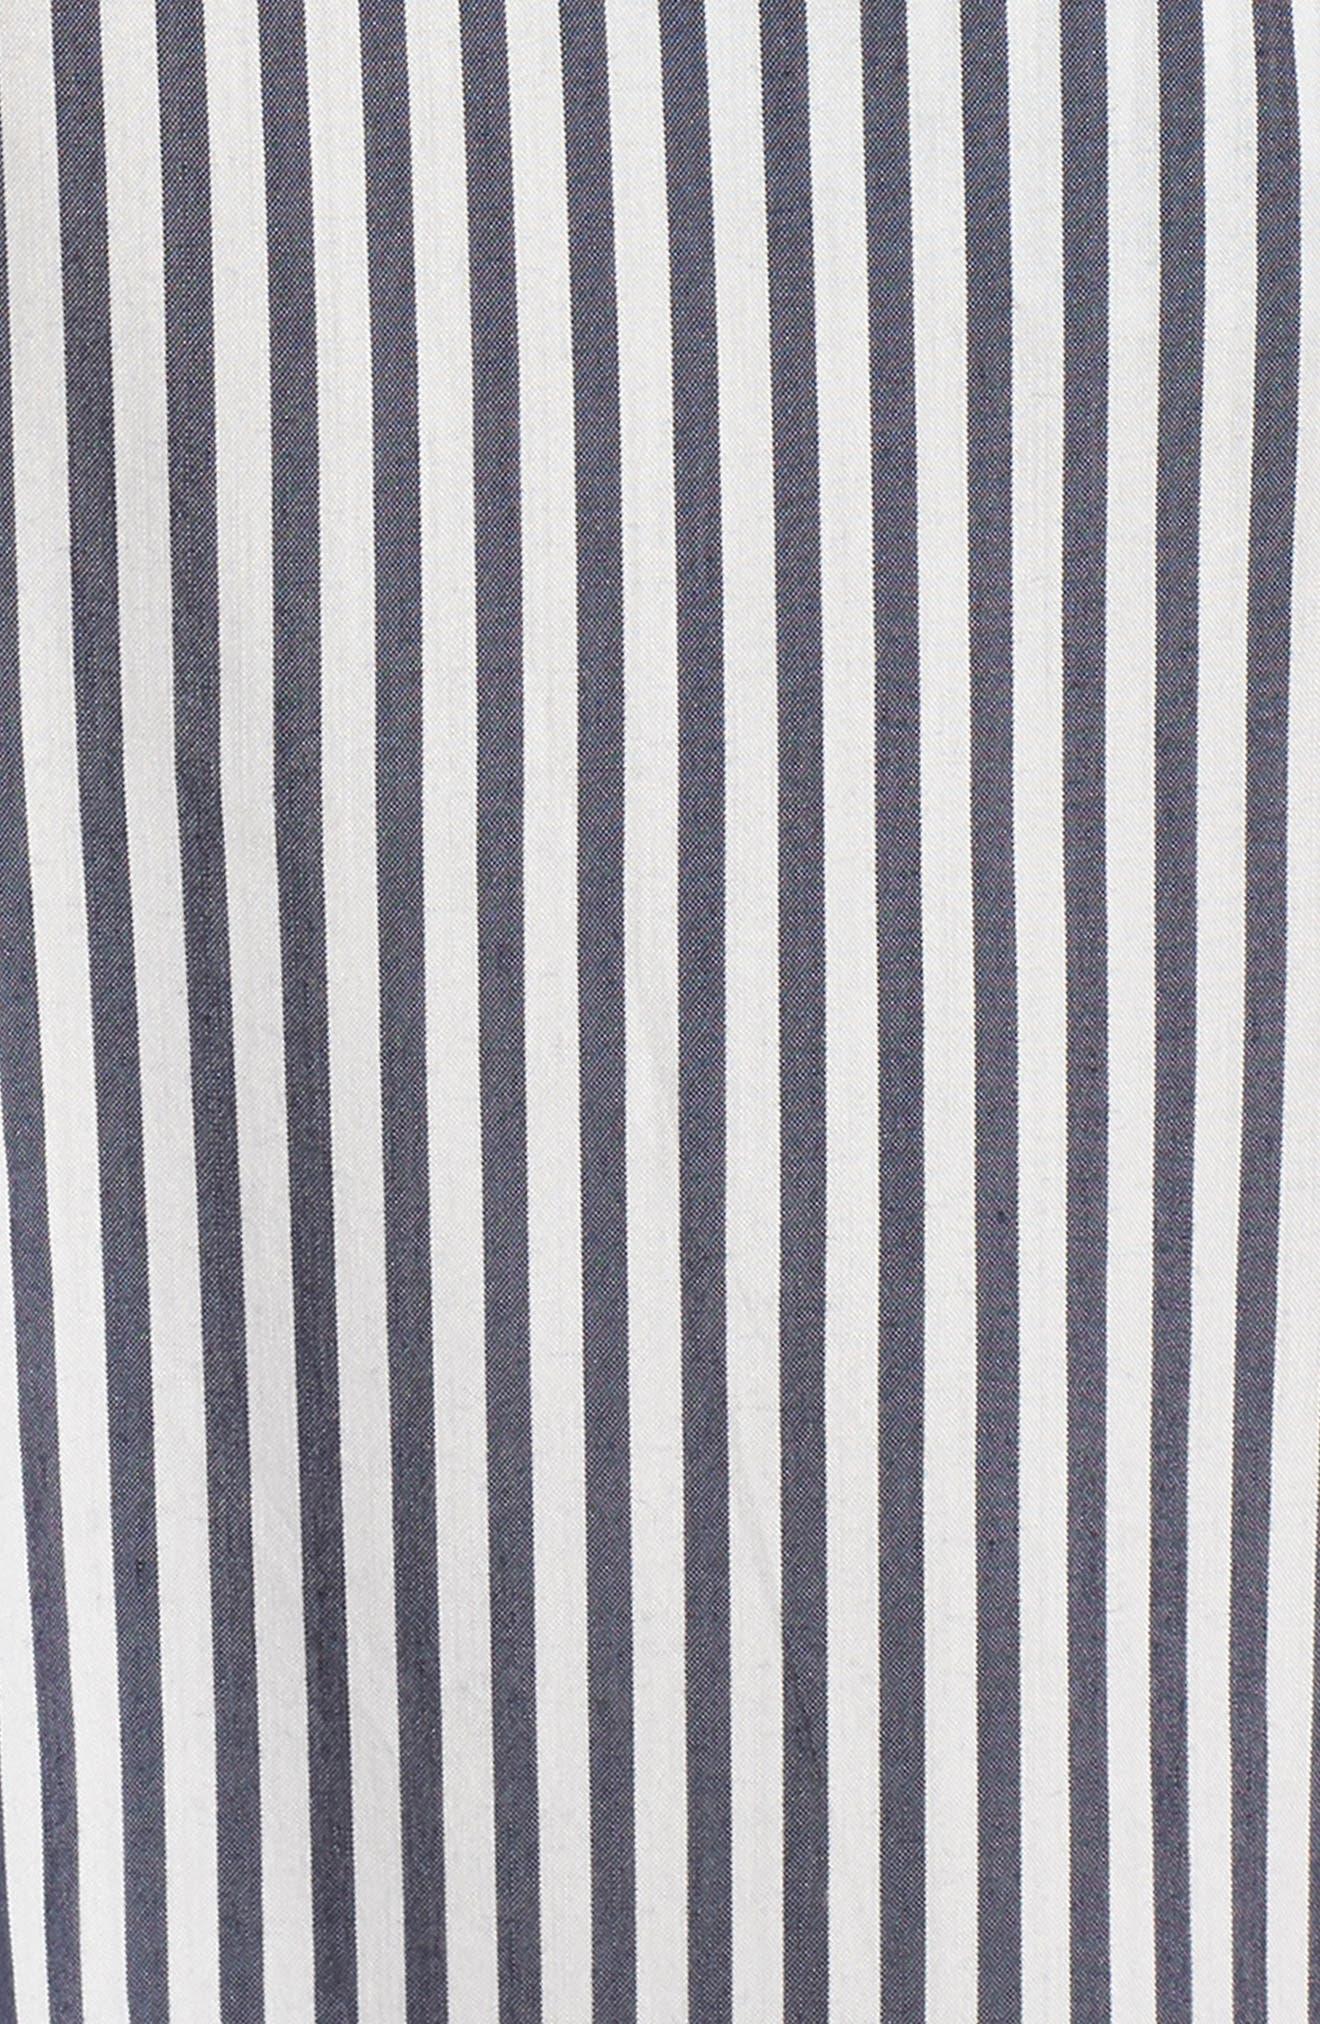 Drinks On Me Stripe Ruffle Midi Dress,                             Alternate thumbnail 5, color,                             Navy/ White Mini Stripe